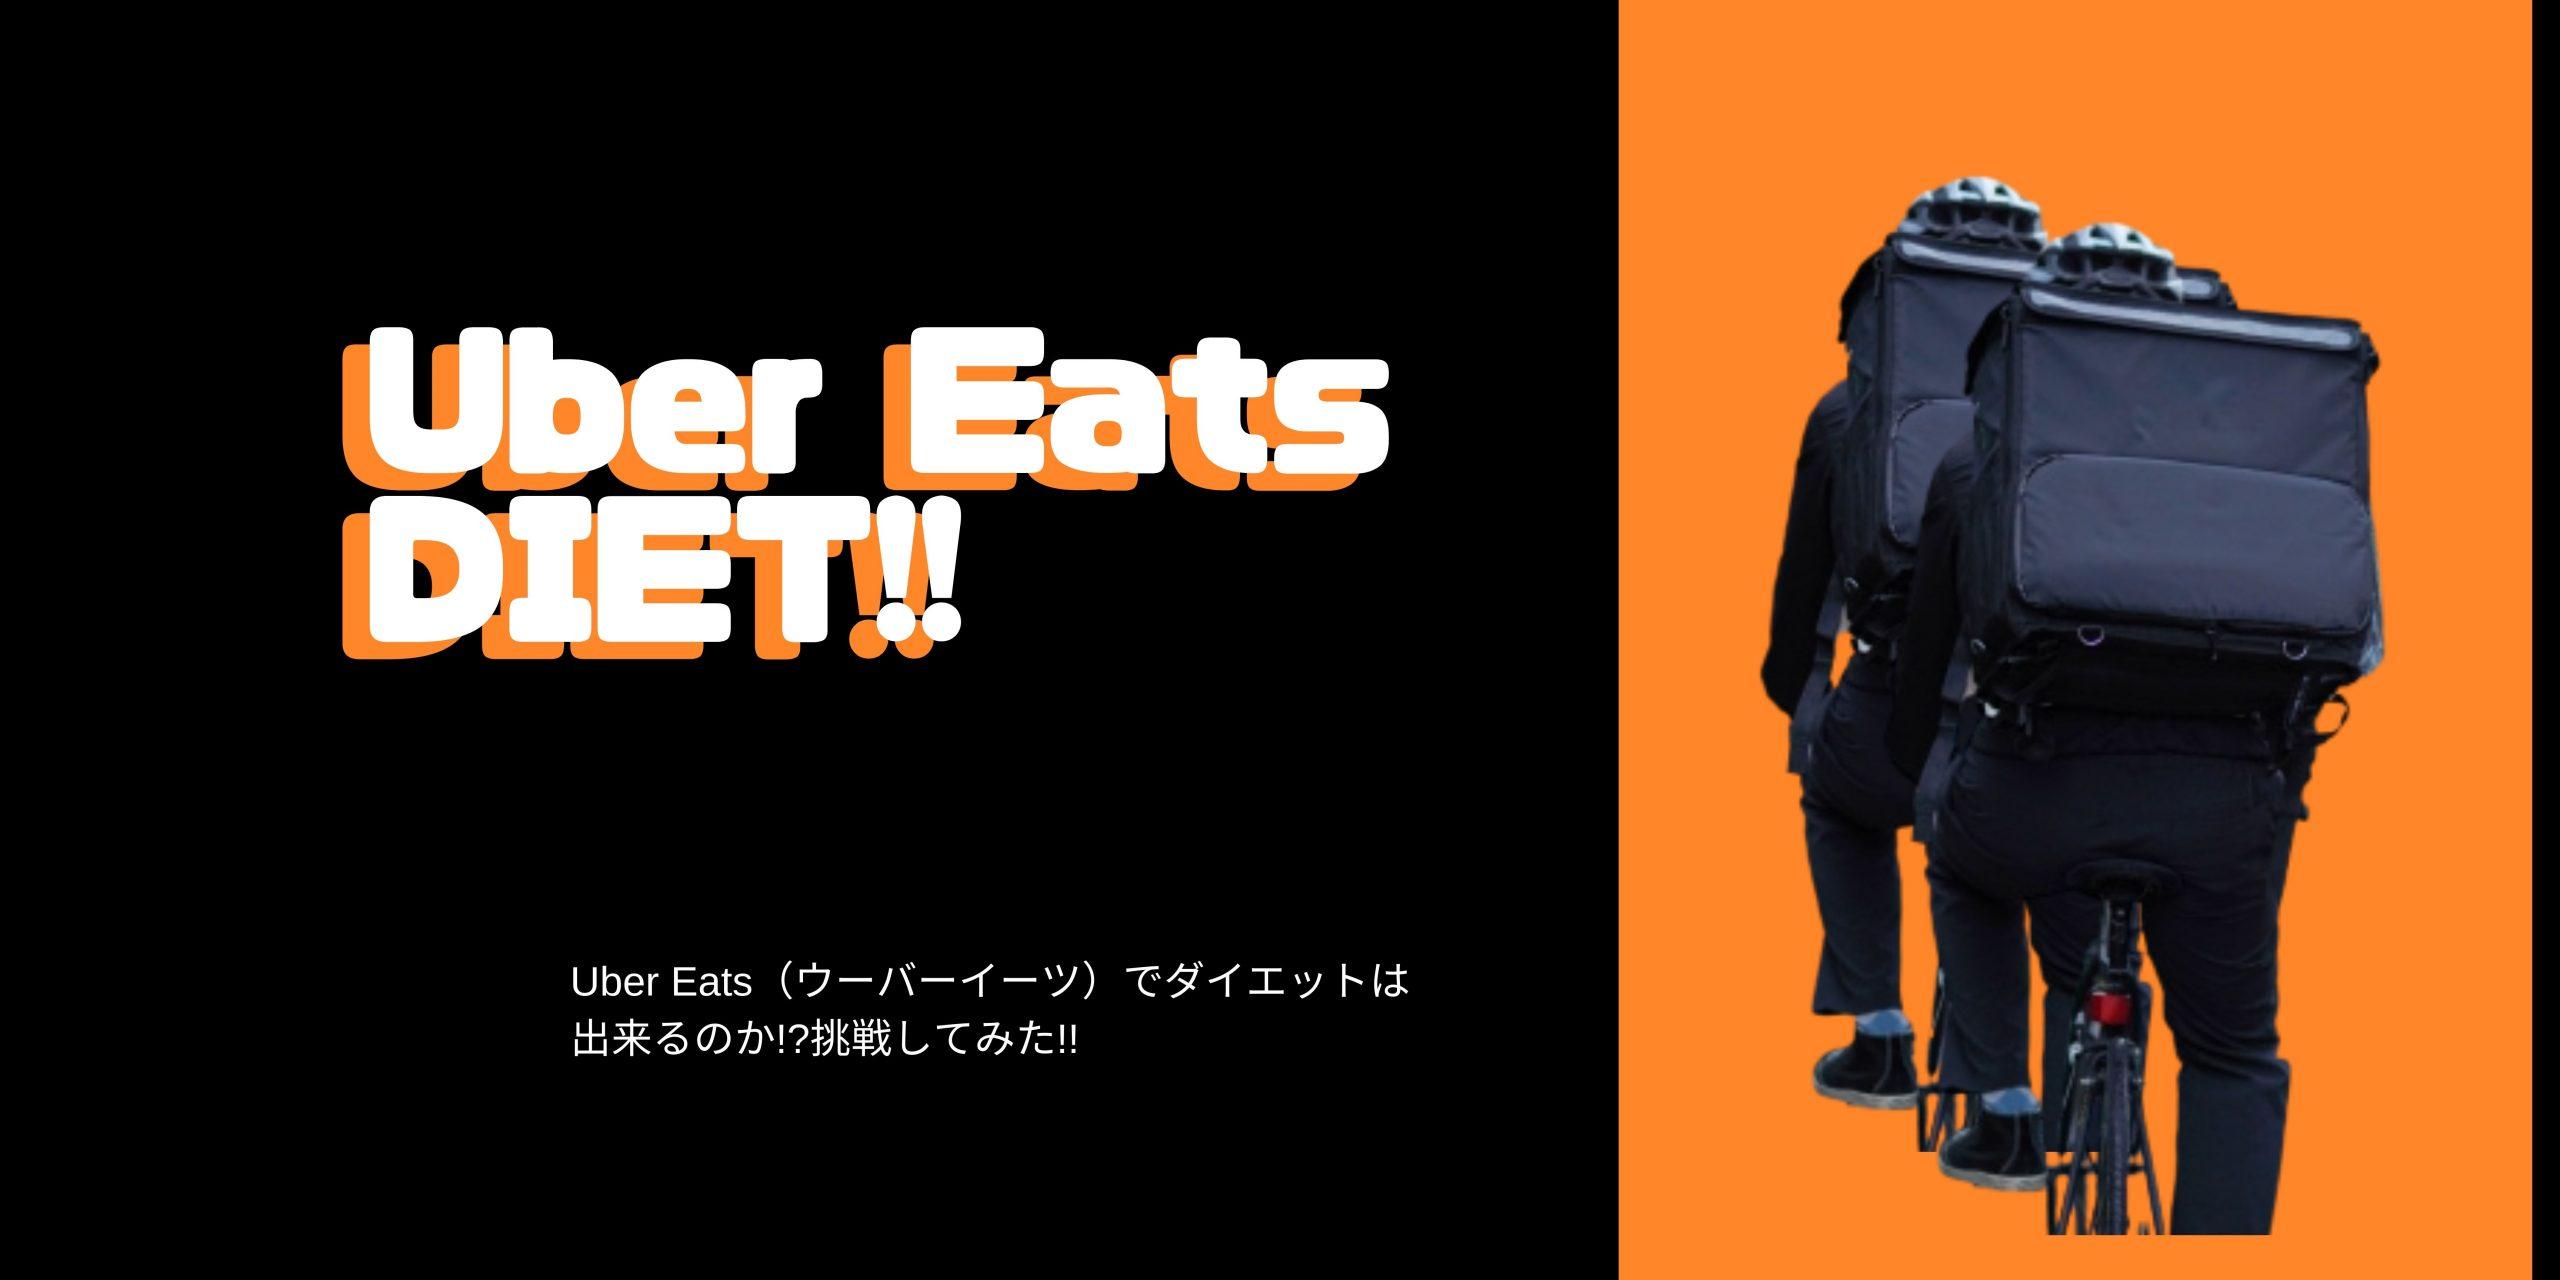 Uber Eats(ウーバーイーツ)